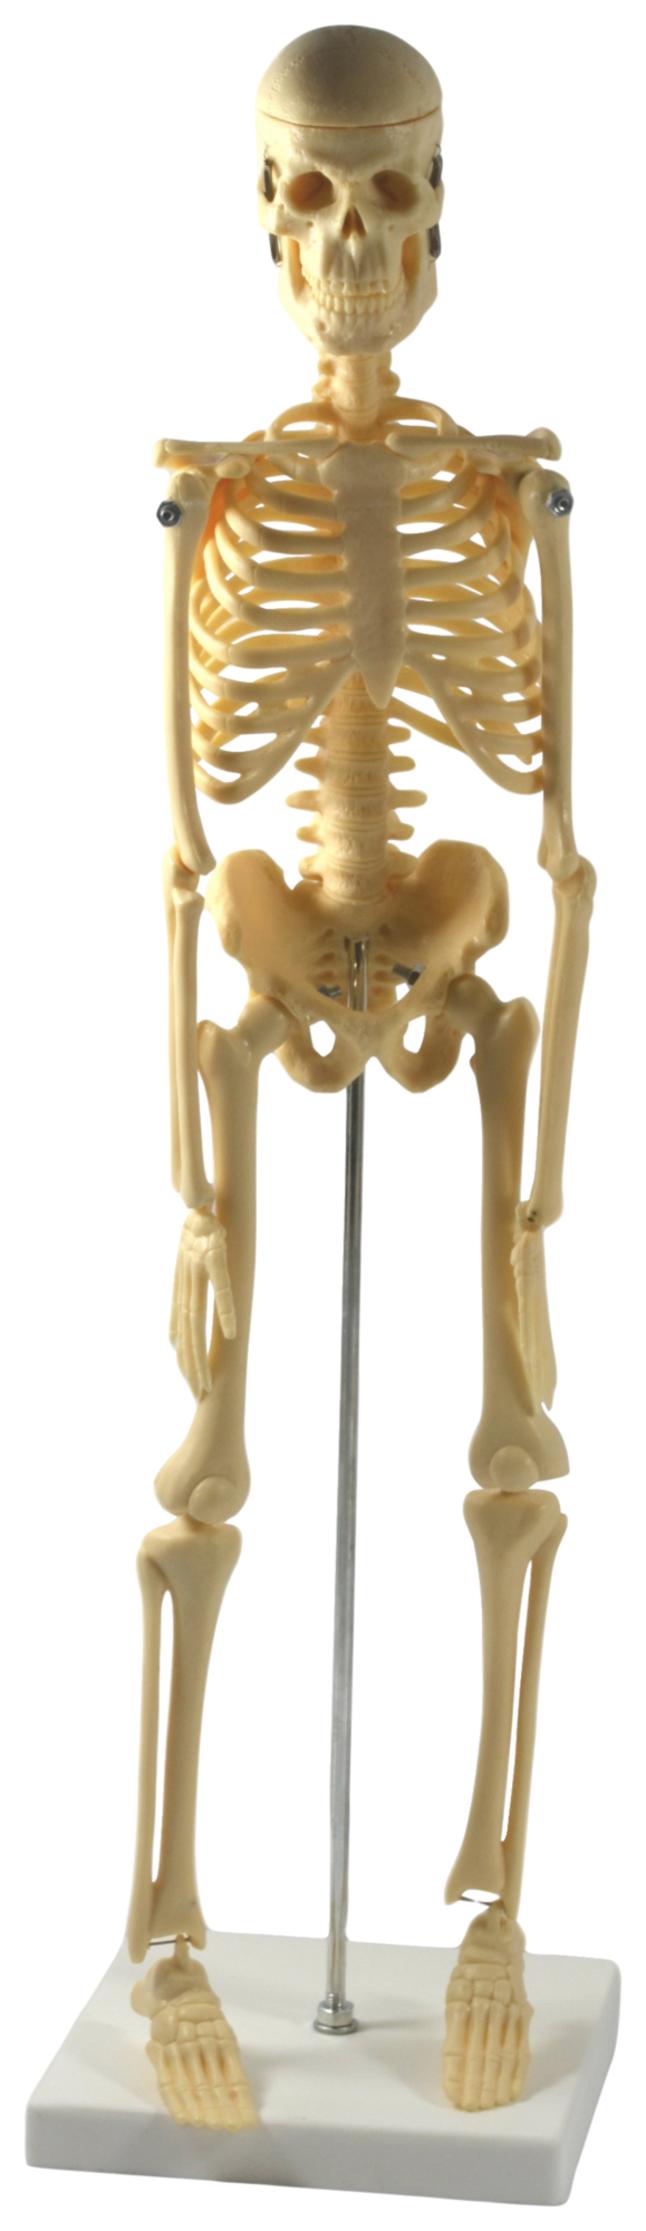 Lab and Anatomical Models, Item Number 2011725